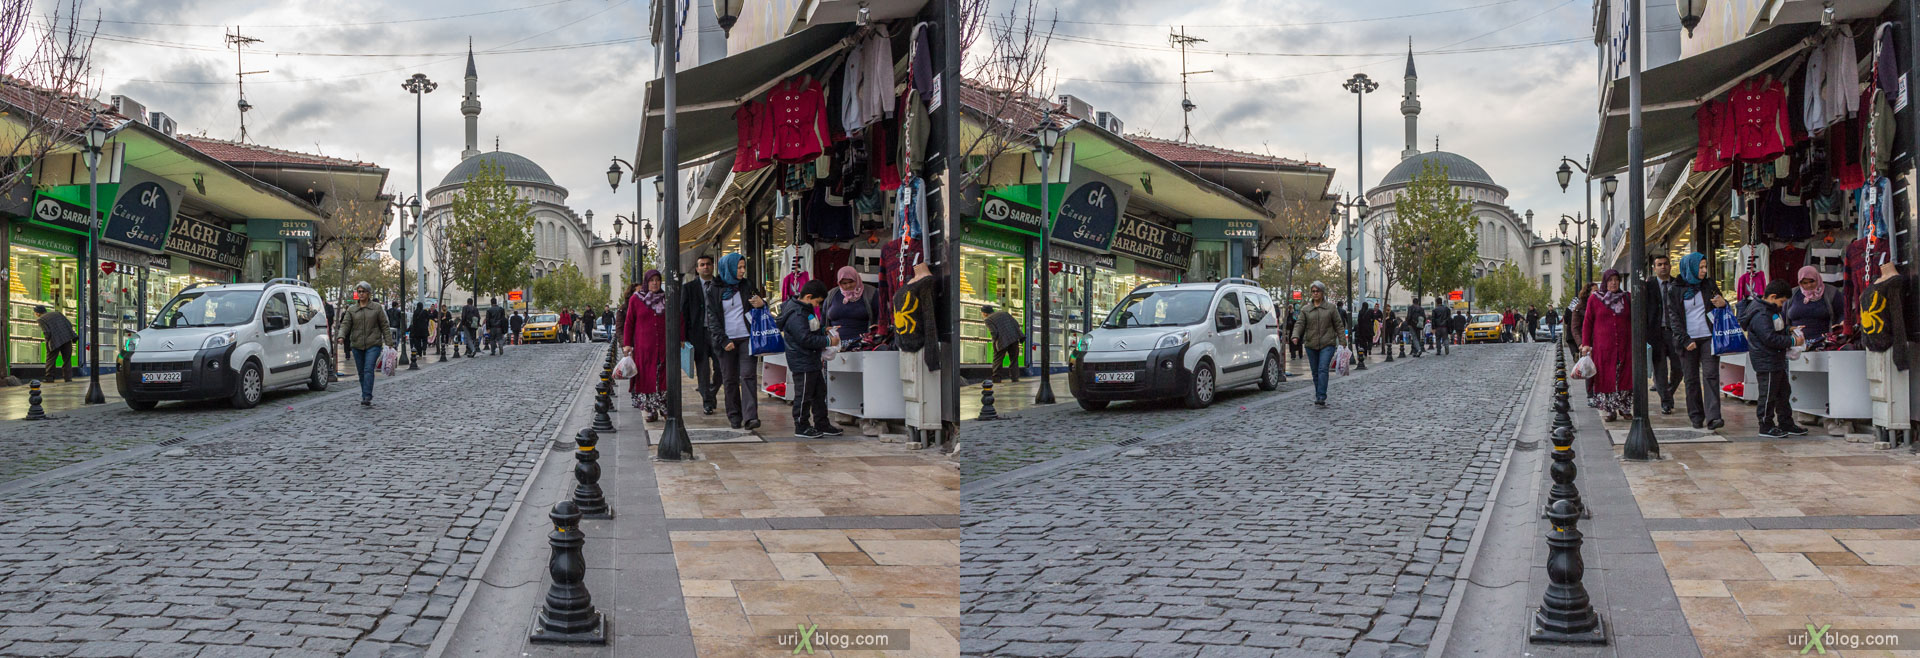 Denizli Turkey  City new picture : Denizli, Turkey, city, 3D, stereo pair, cross eyed, crossview, cross ...